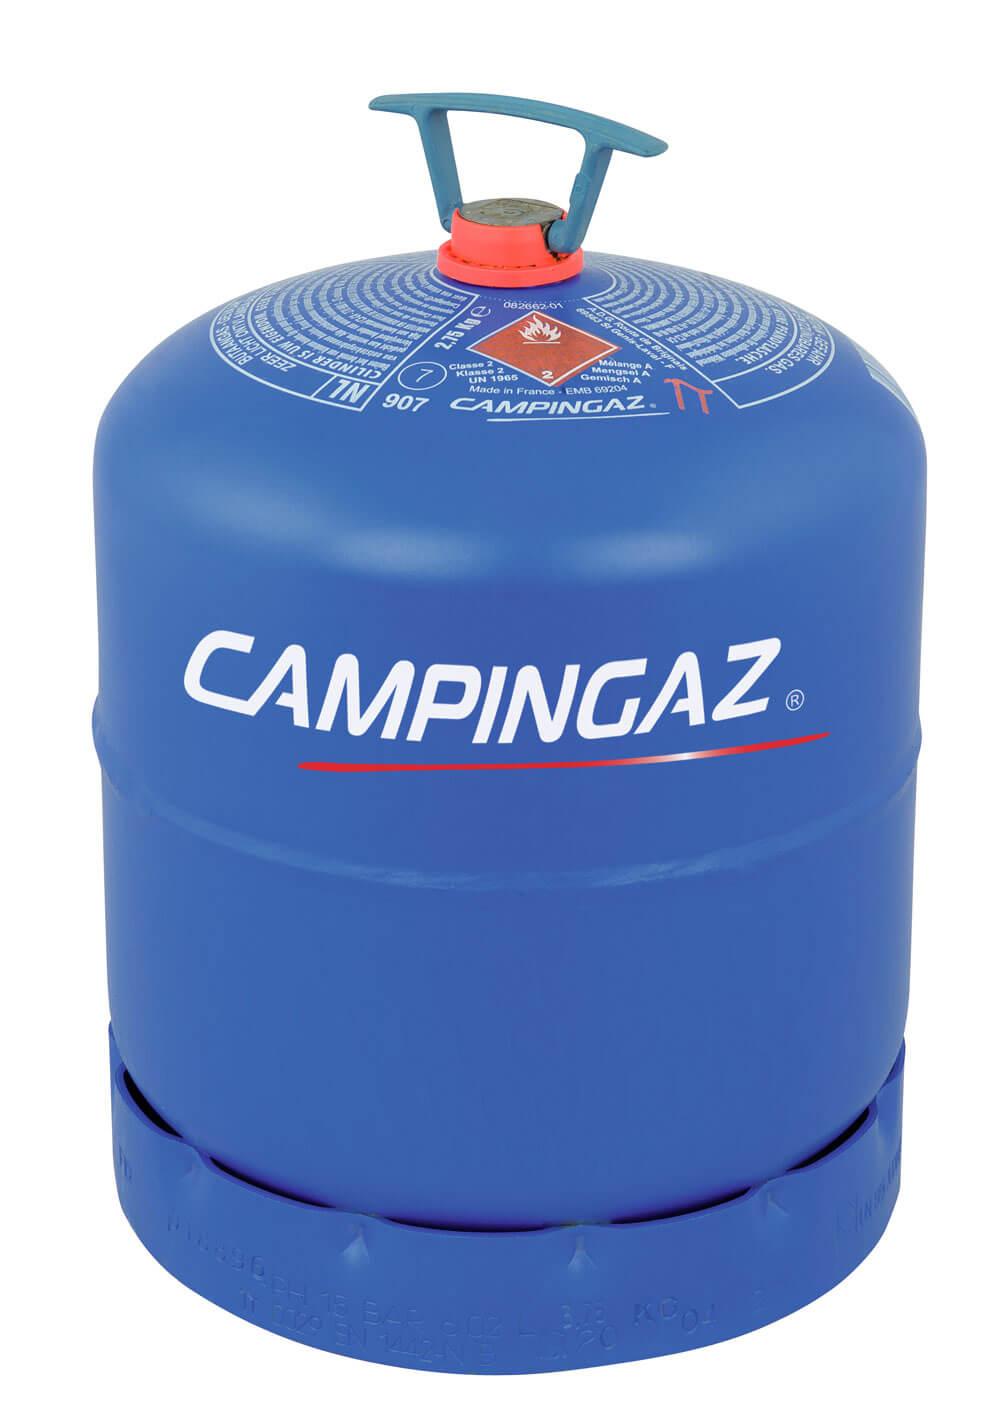 Campingaz Gasflasche R 907